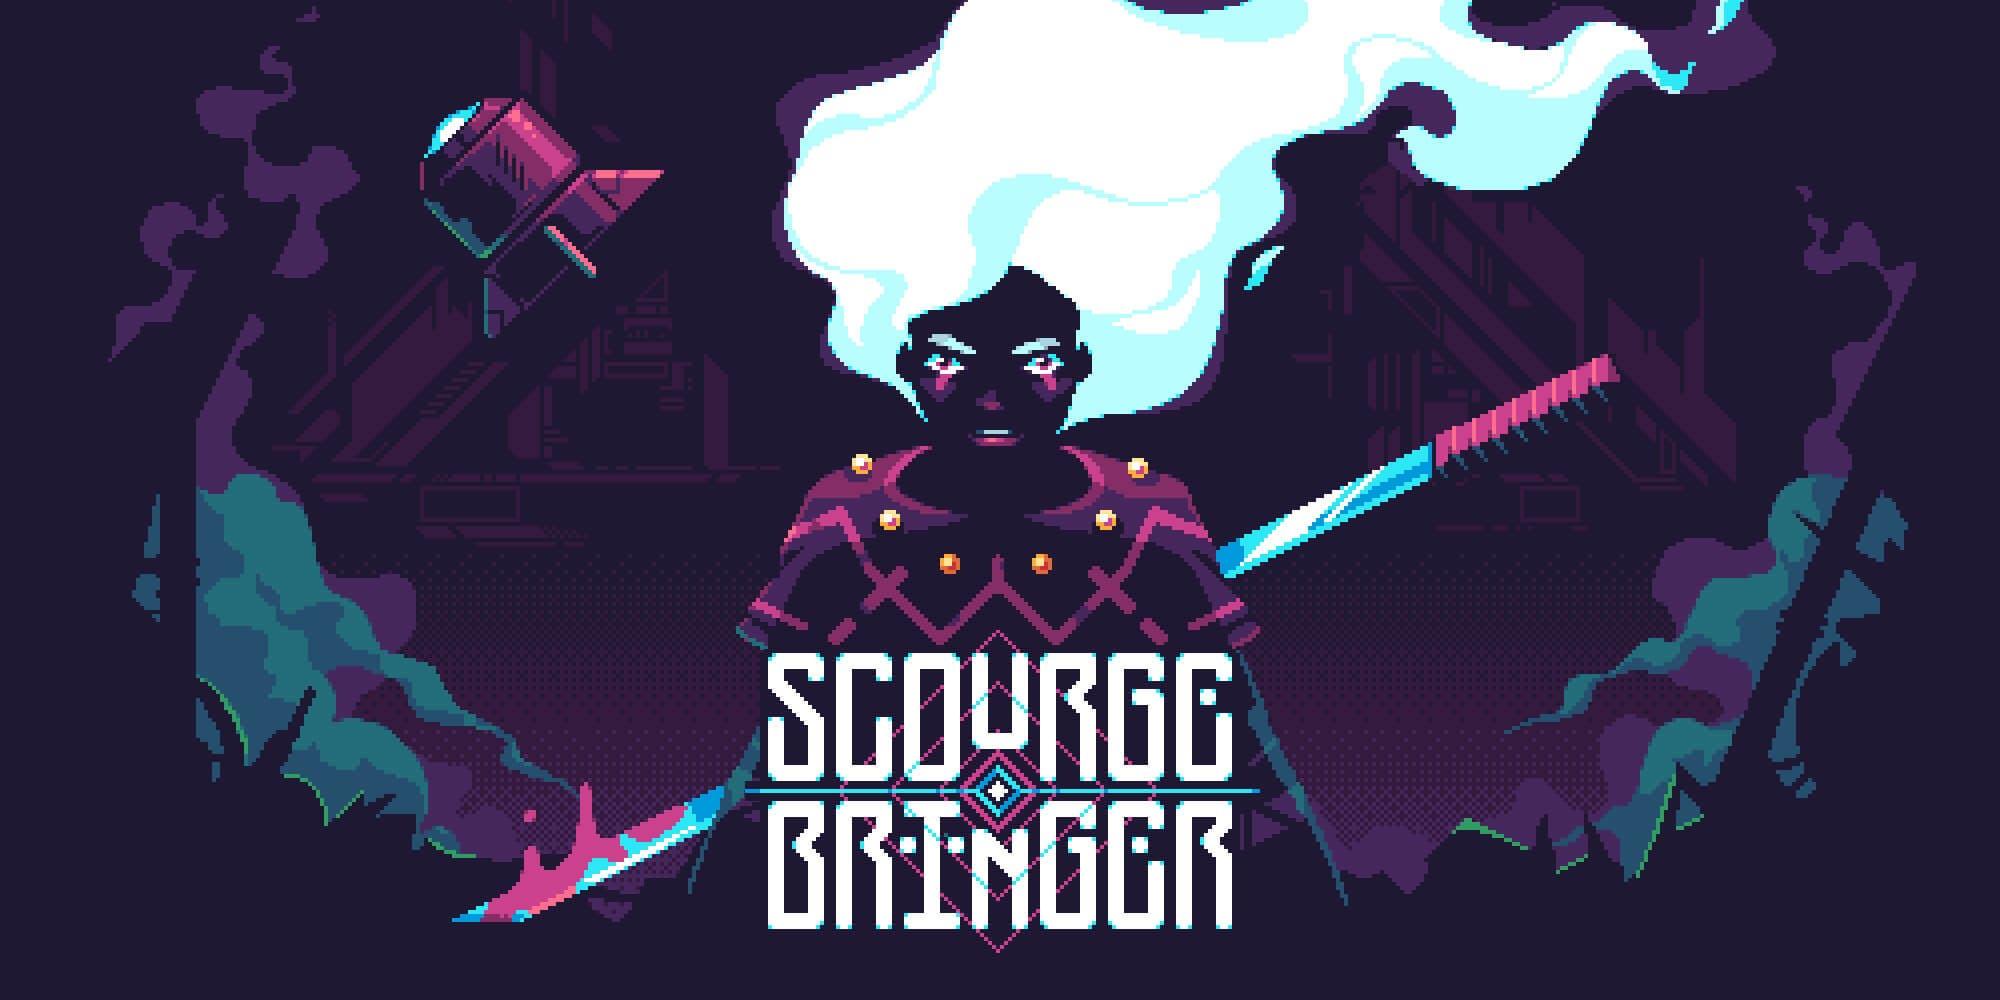 ScourgeBringer en Xbox Game Pass